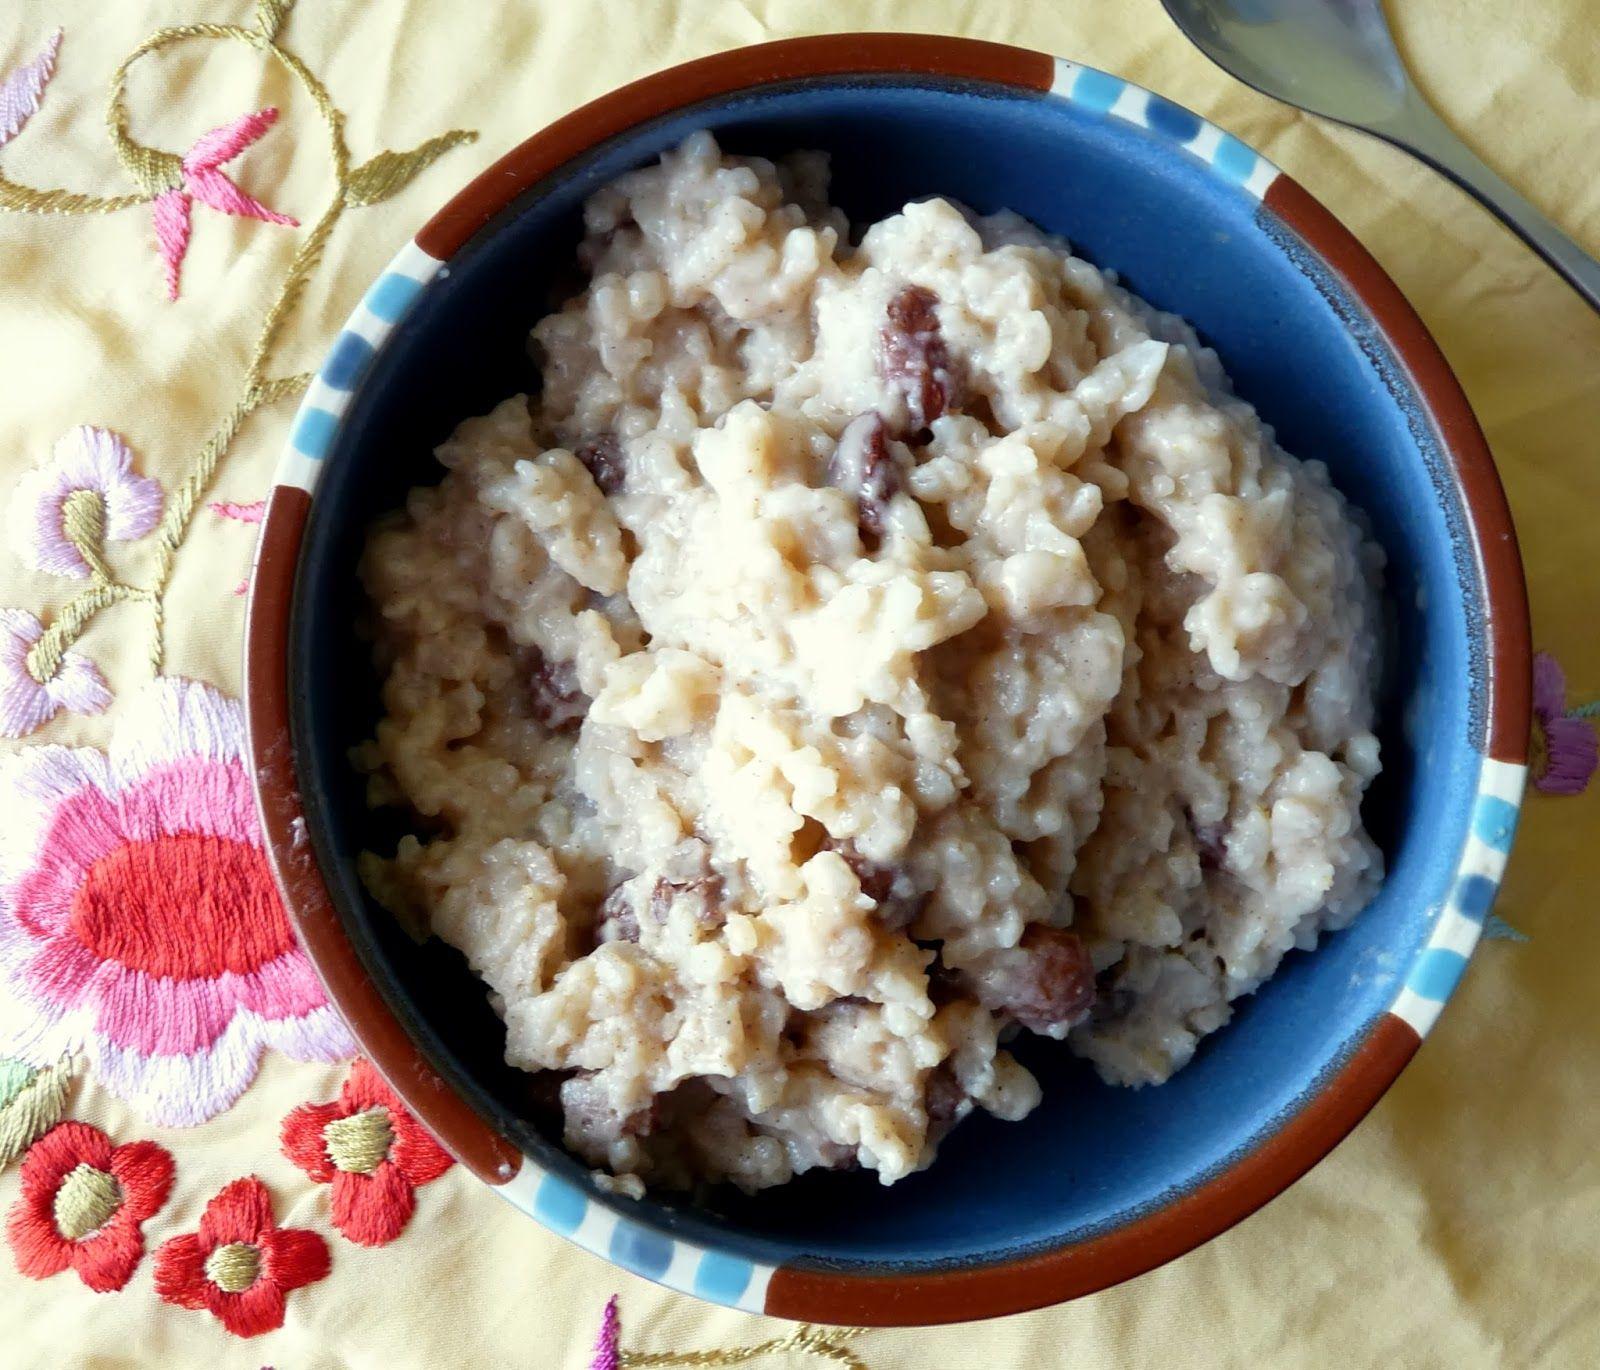 Seasonal Ontario Food: Mexican Rice Pudding